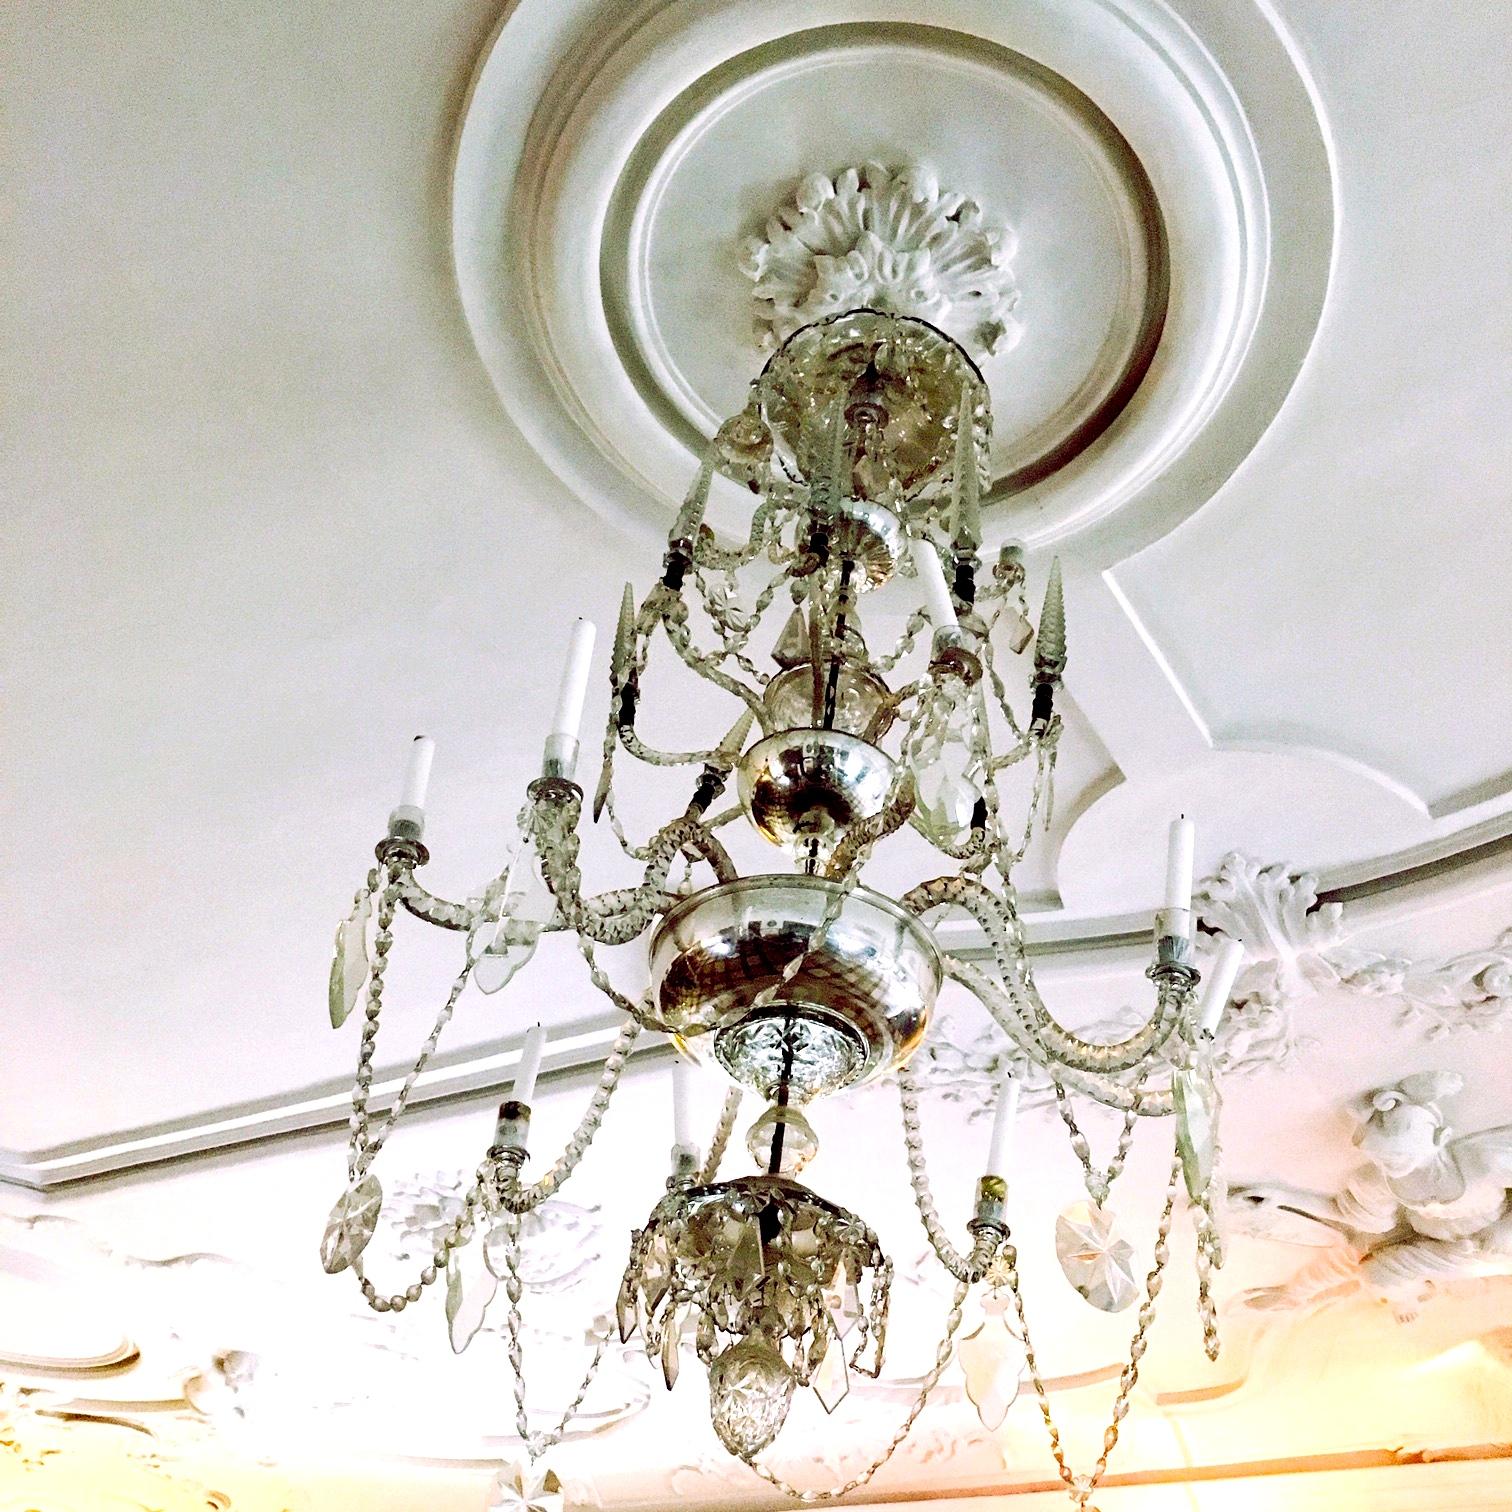 Lysekronen i riddersalen